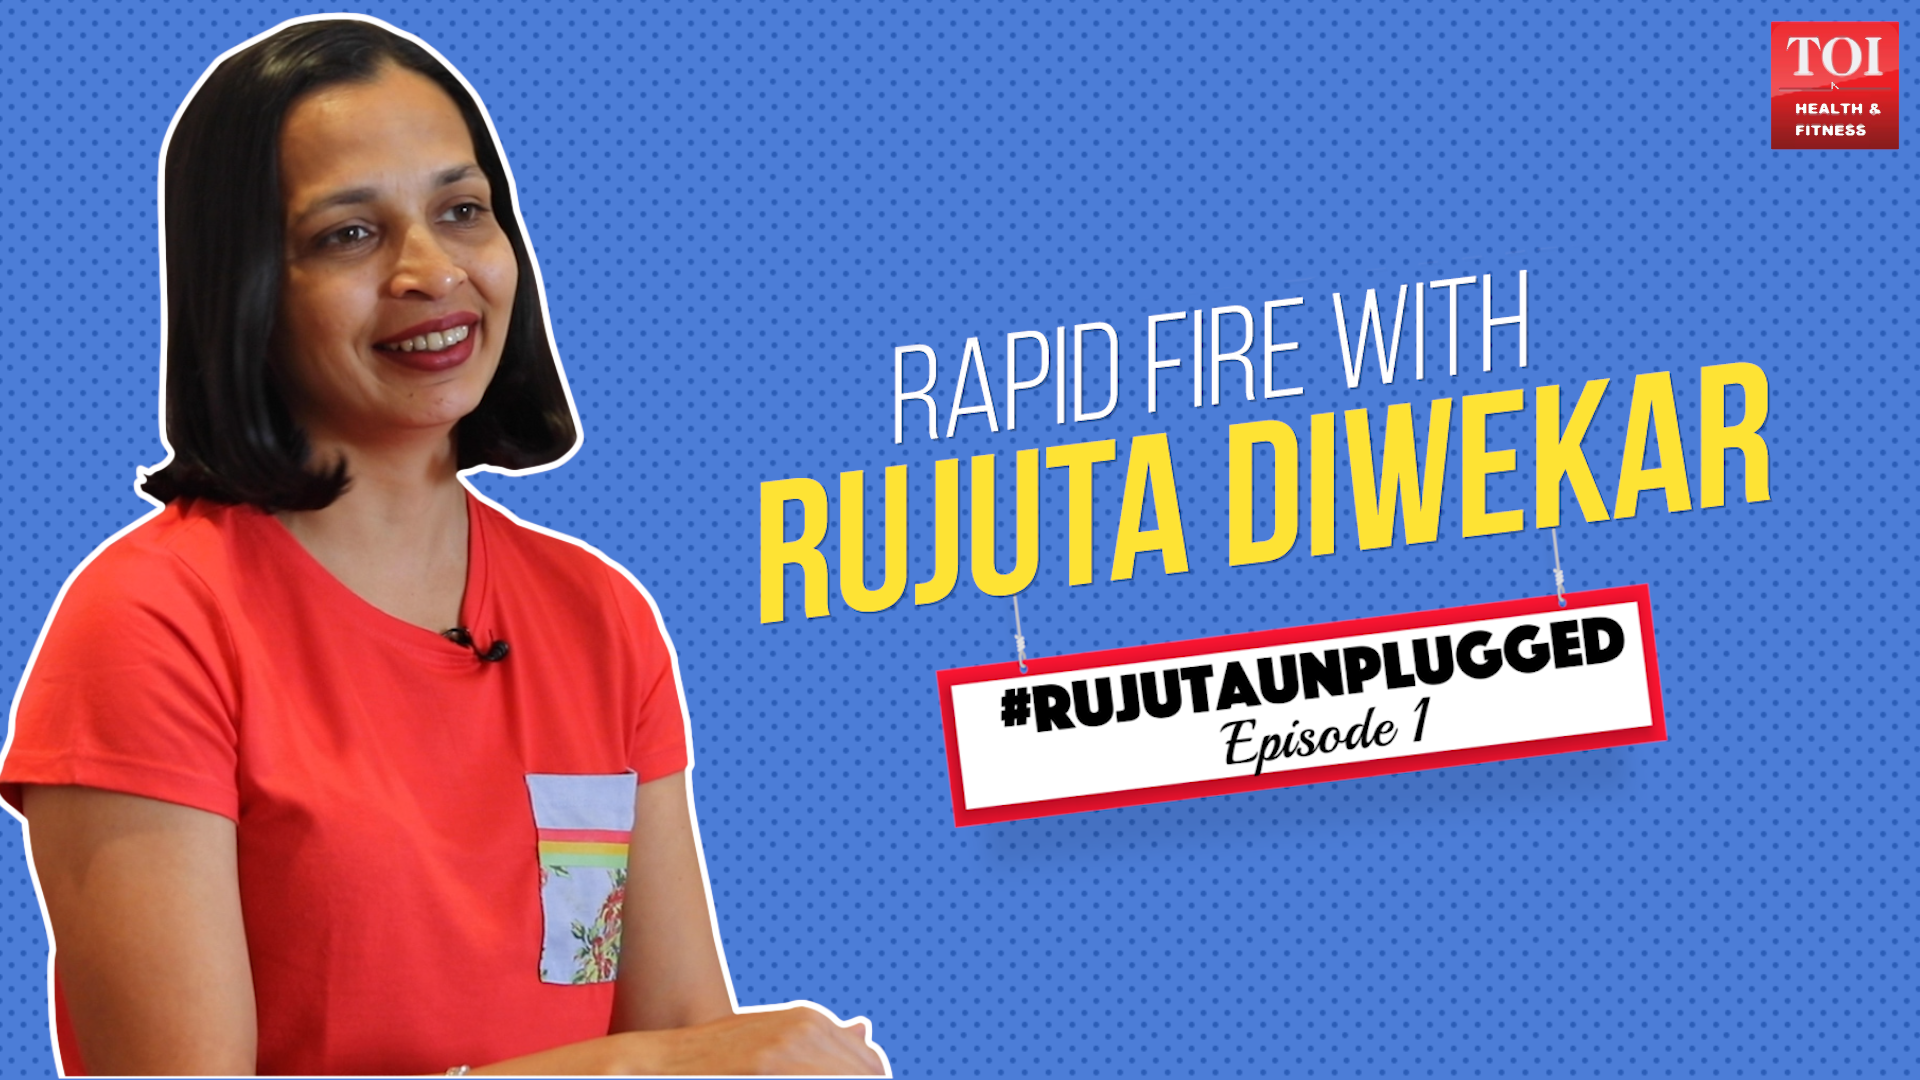 watch-rapid-fire-with-rujuta-diwekar